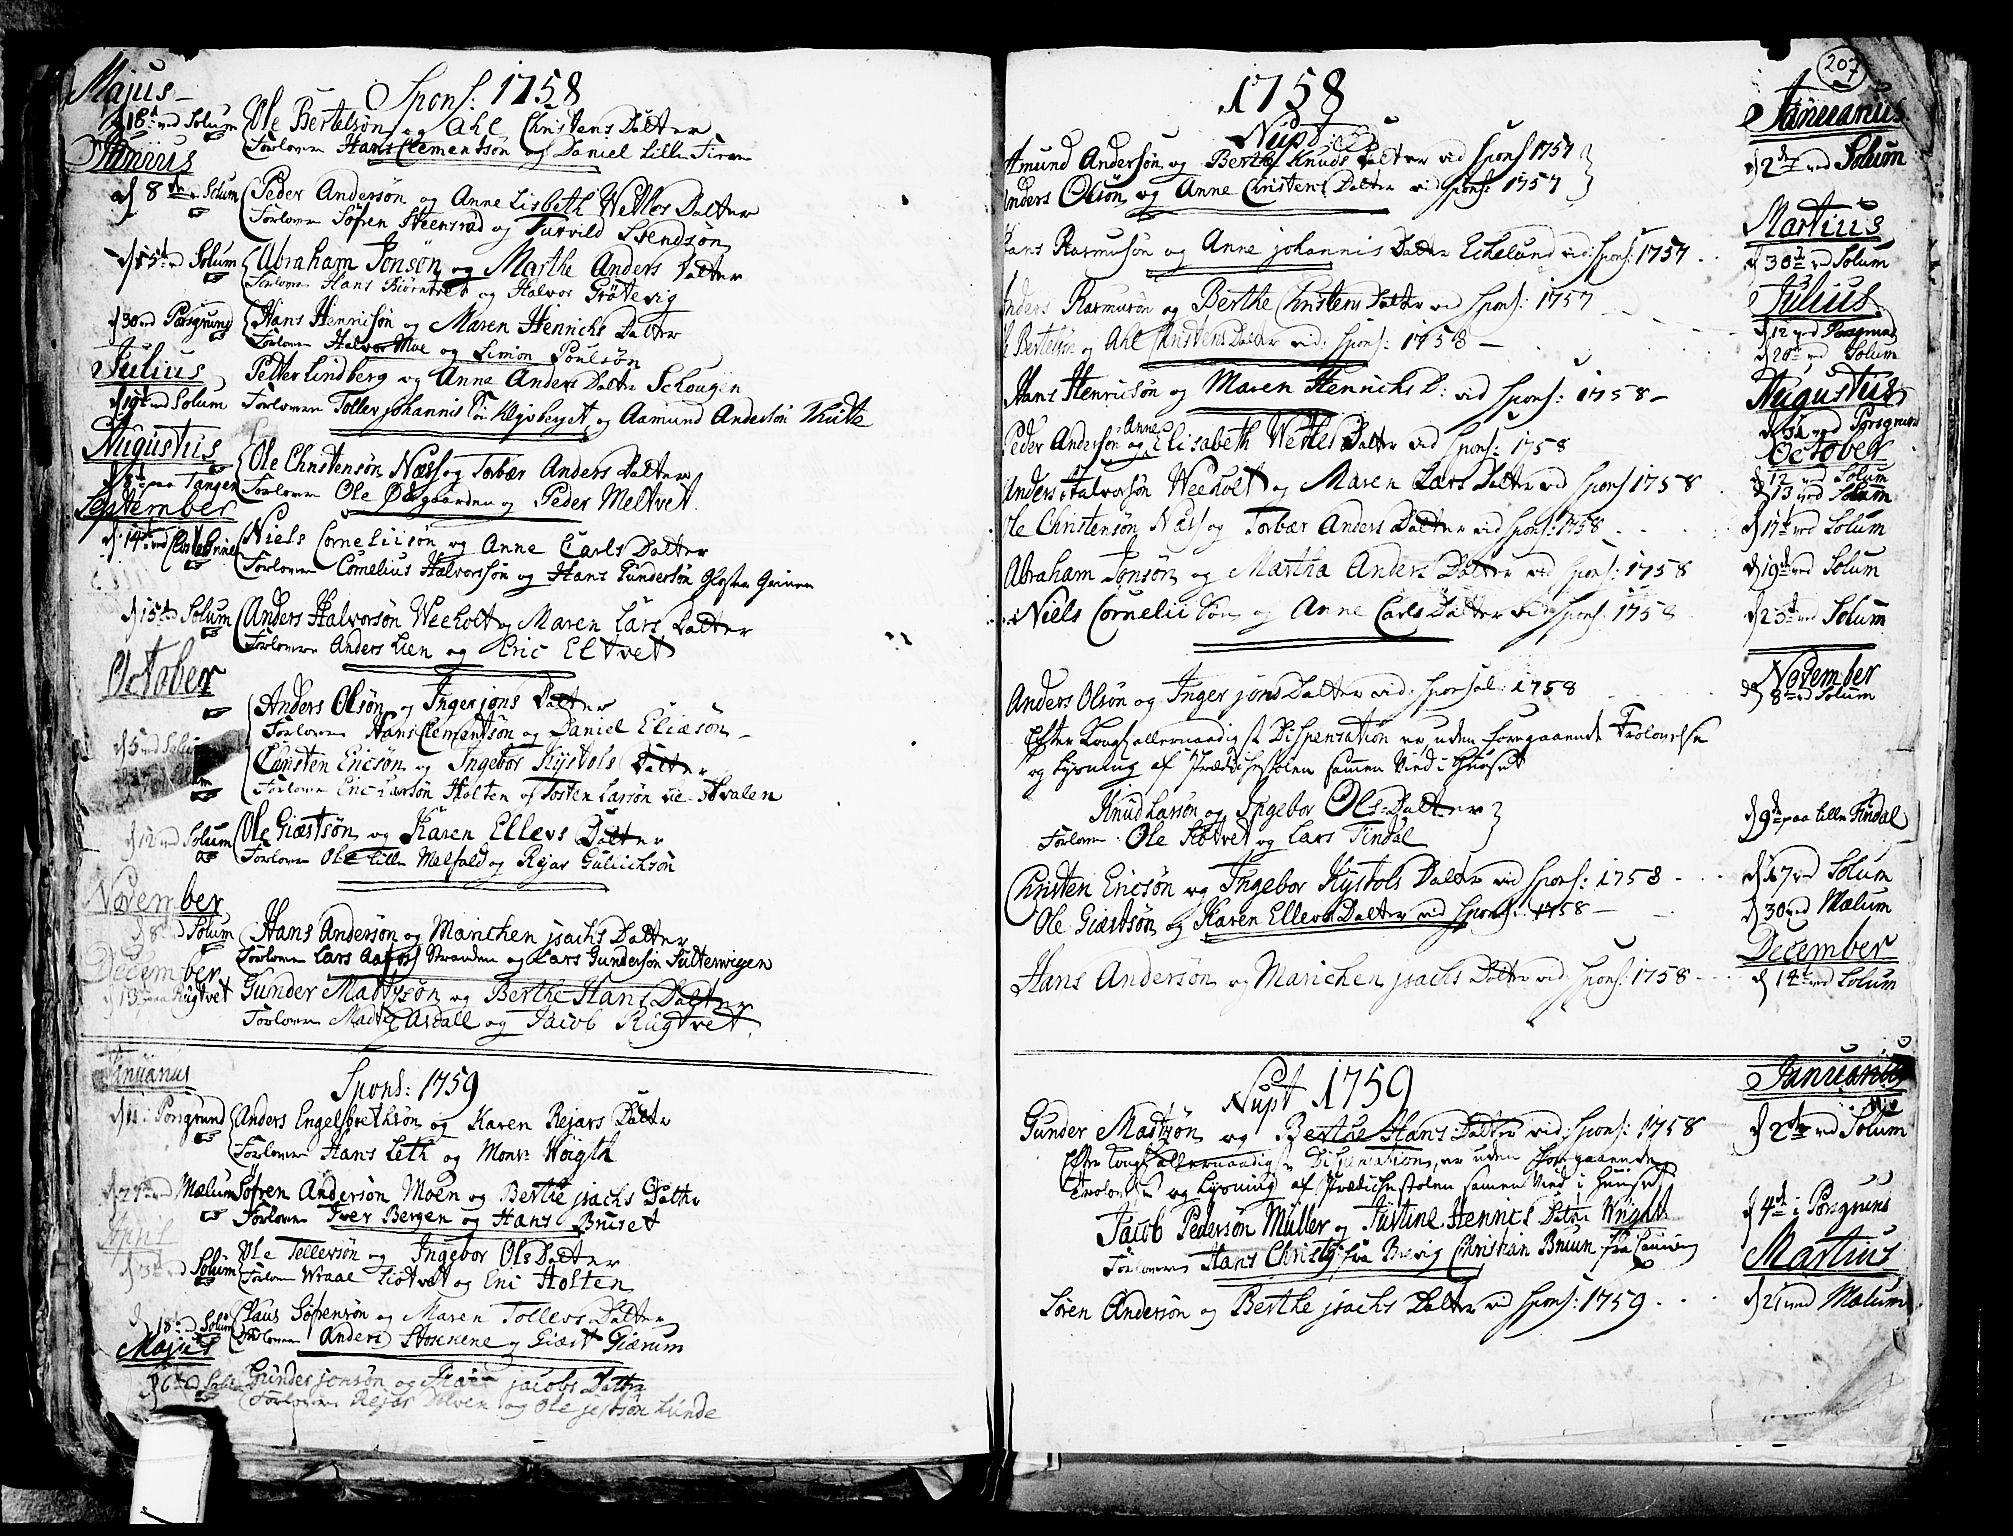 SAKO, Solum kirkebøker, F/Fa/L0002: Ministerialbok nr. I 2, 1713-1761, s. 207